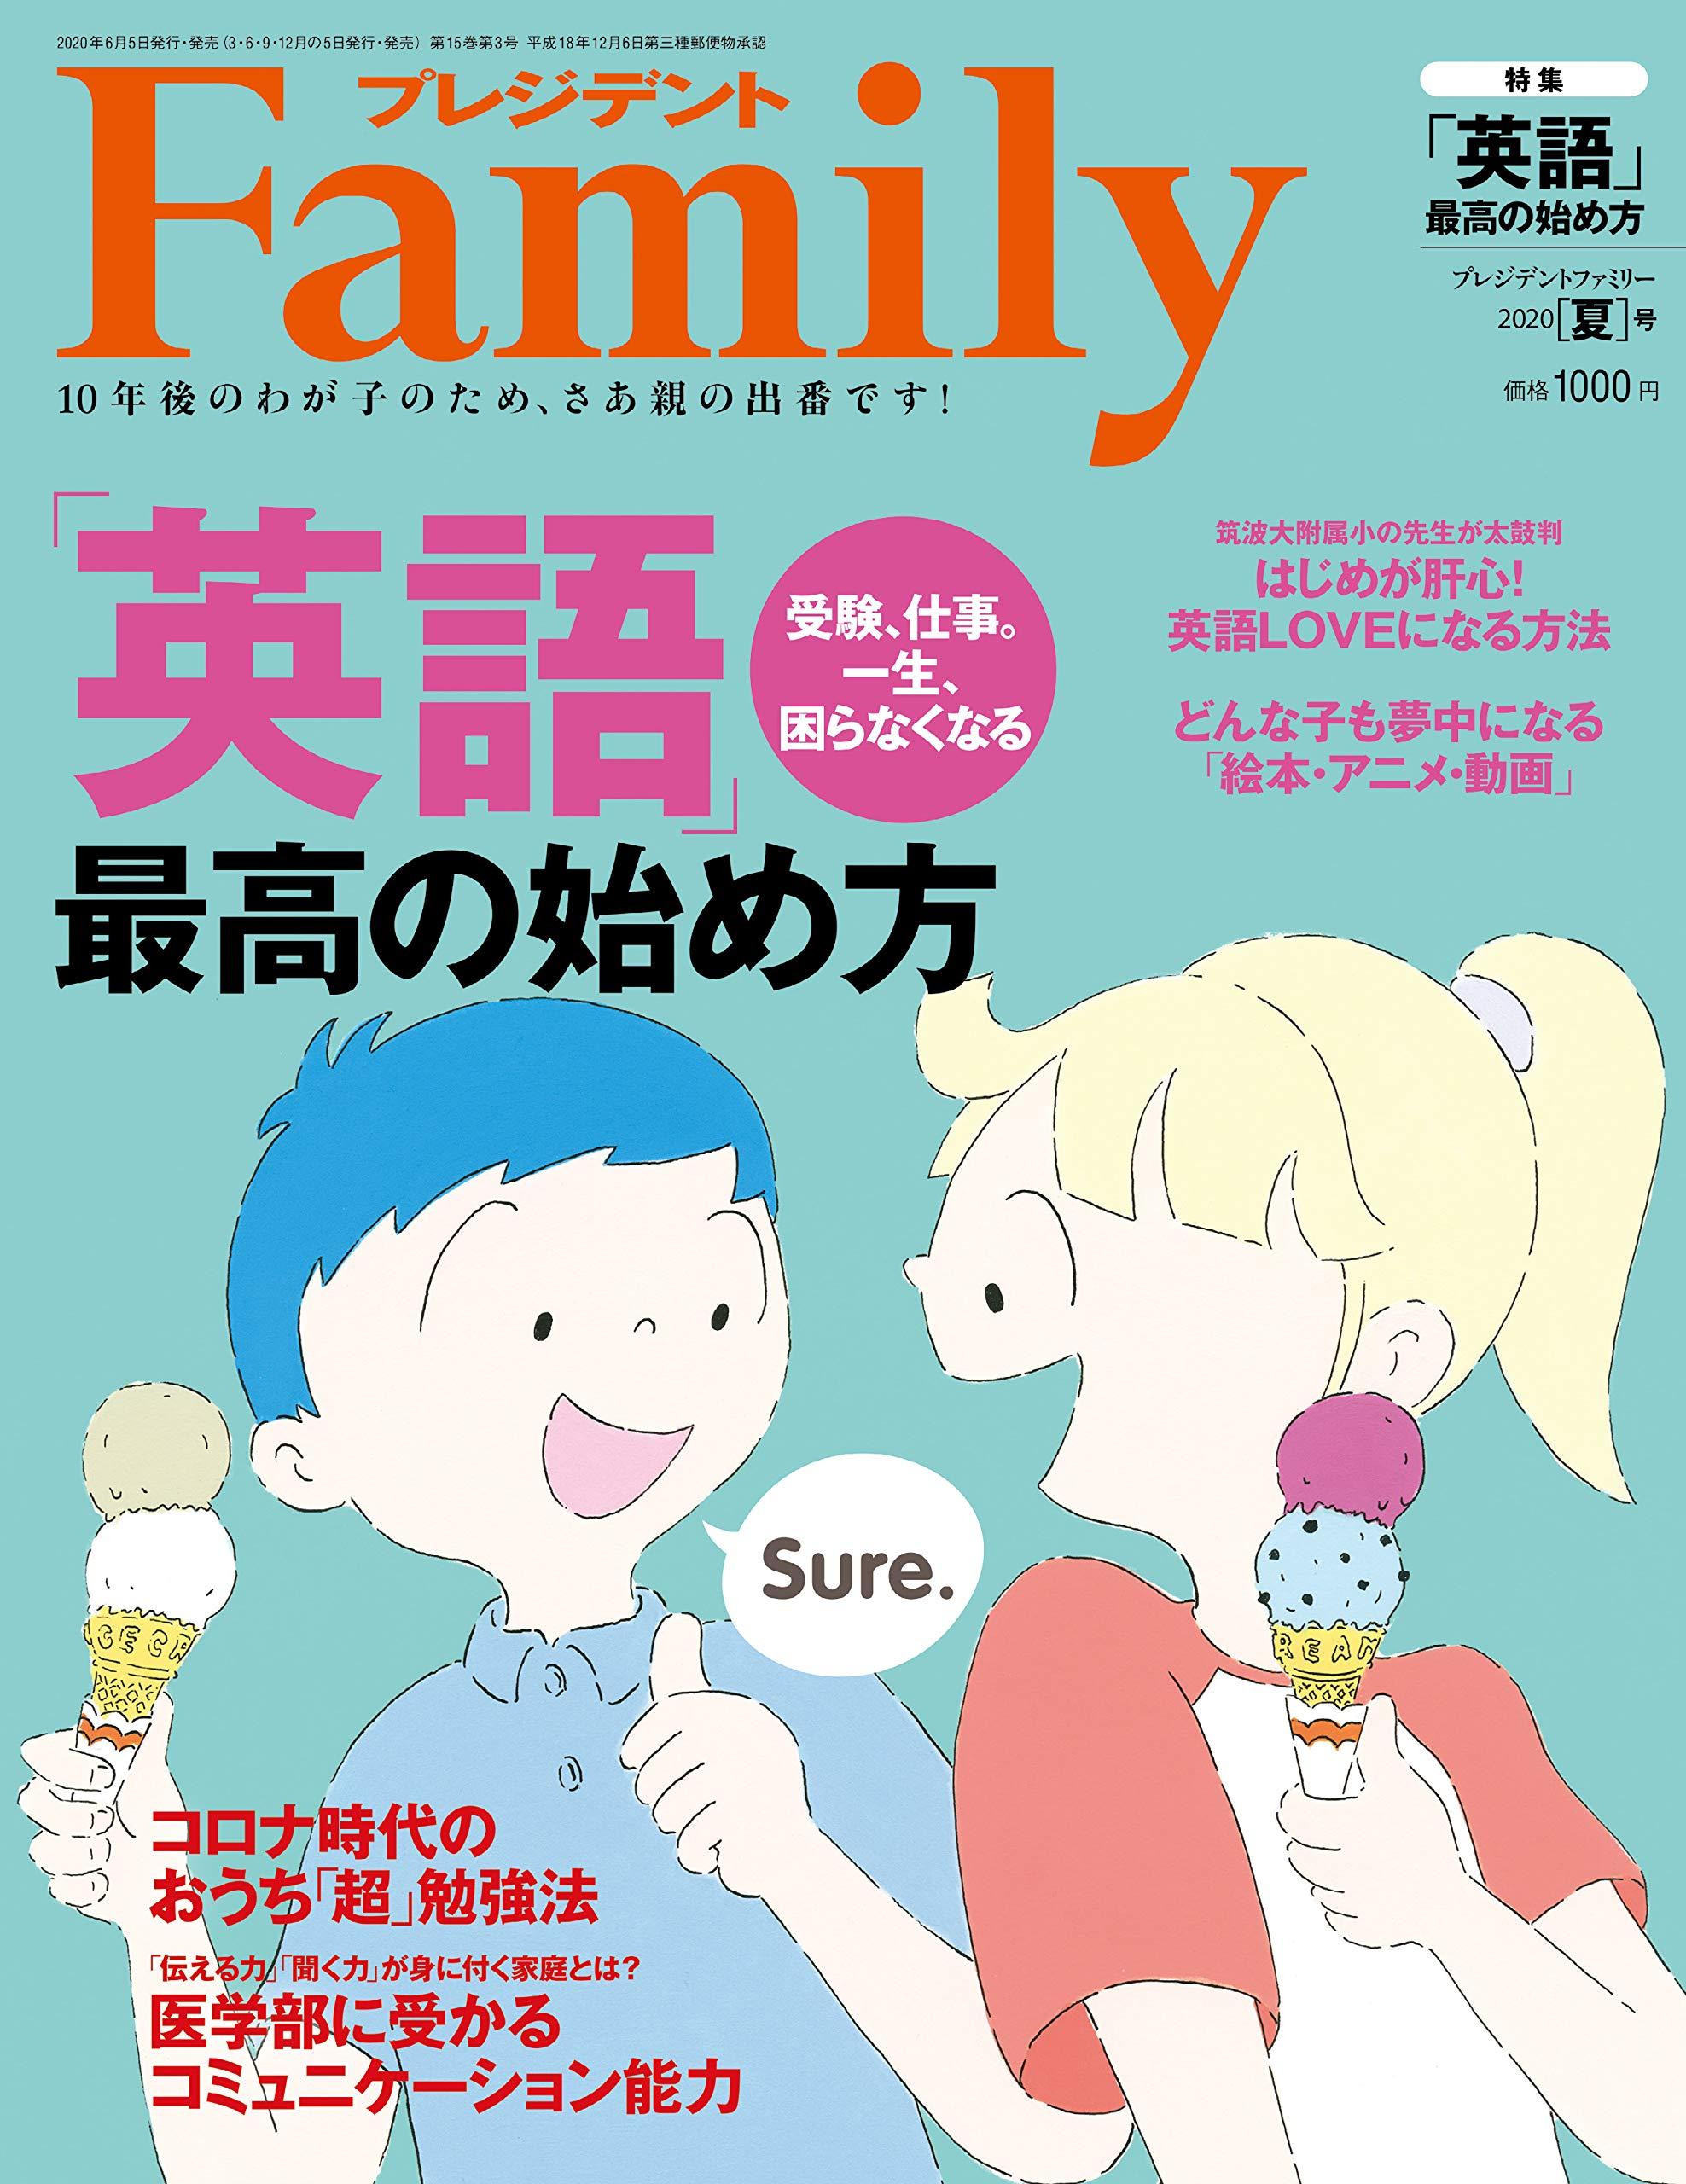 f:id:worldfamily_PR:20200604105308j:plain